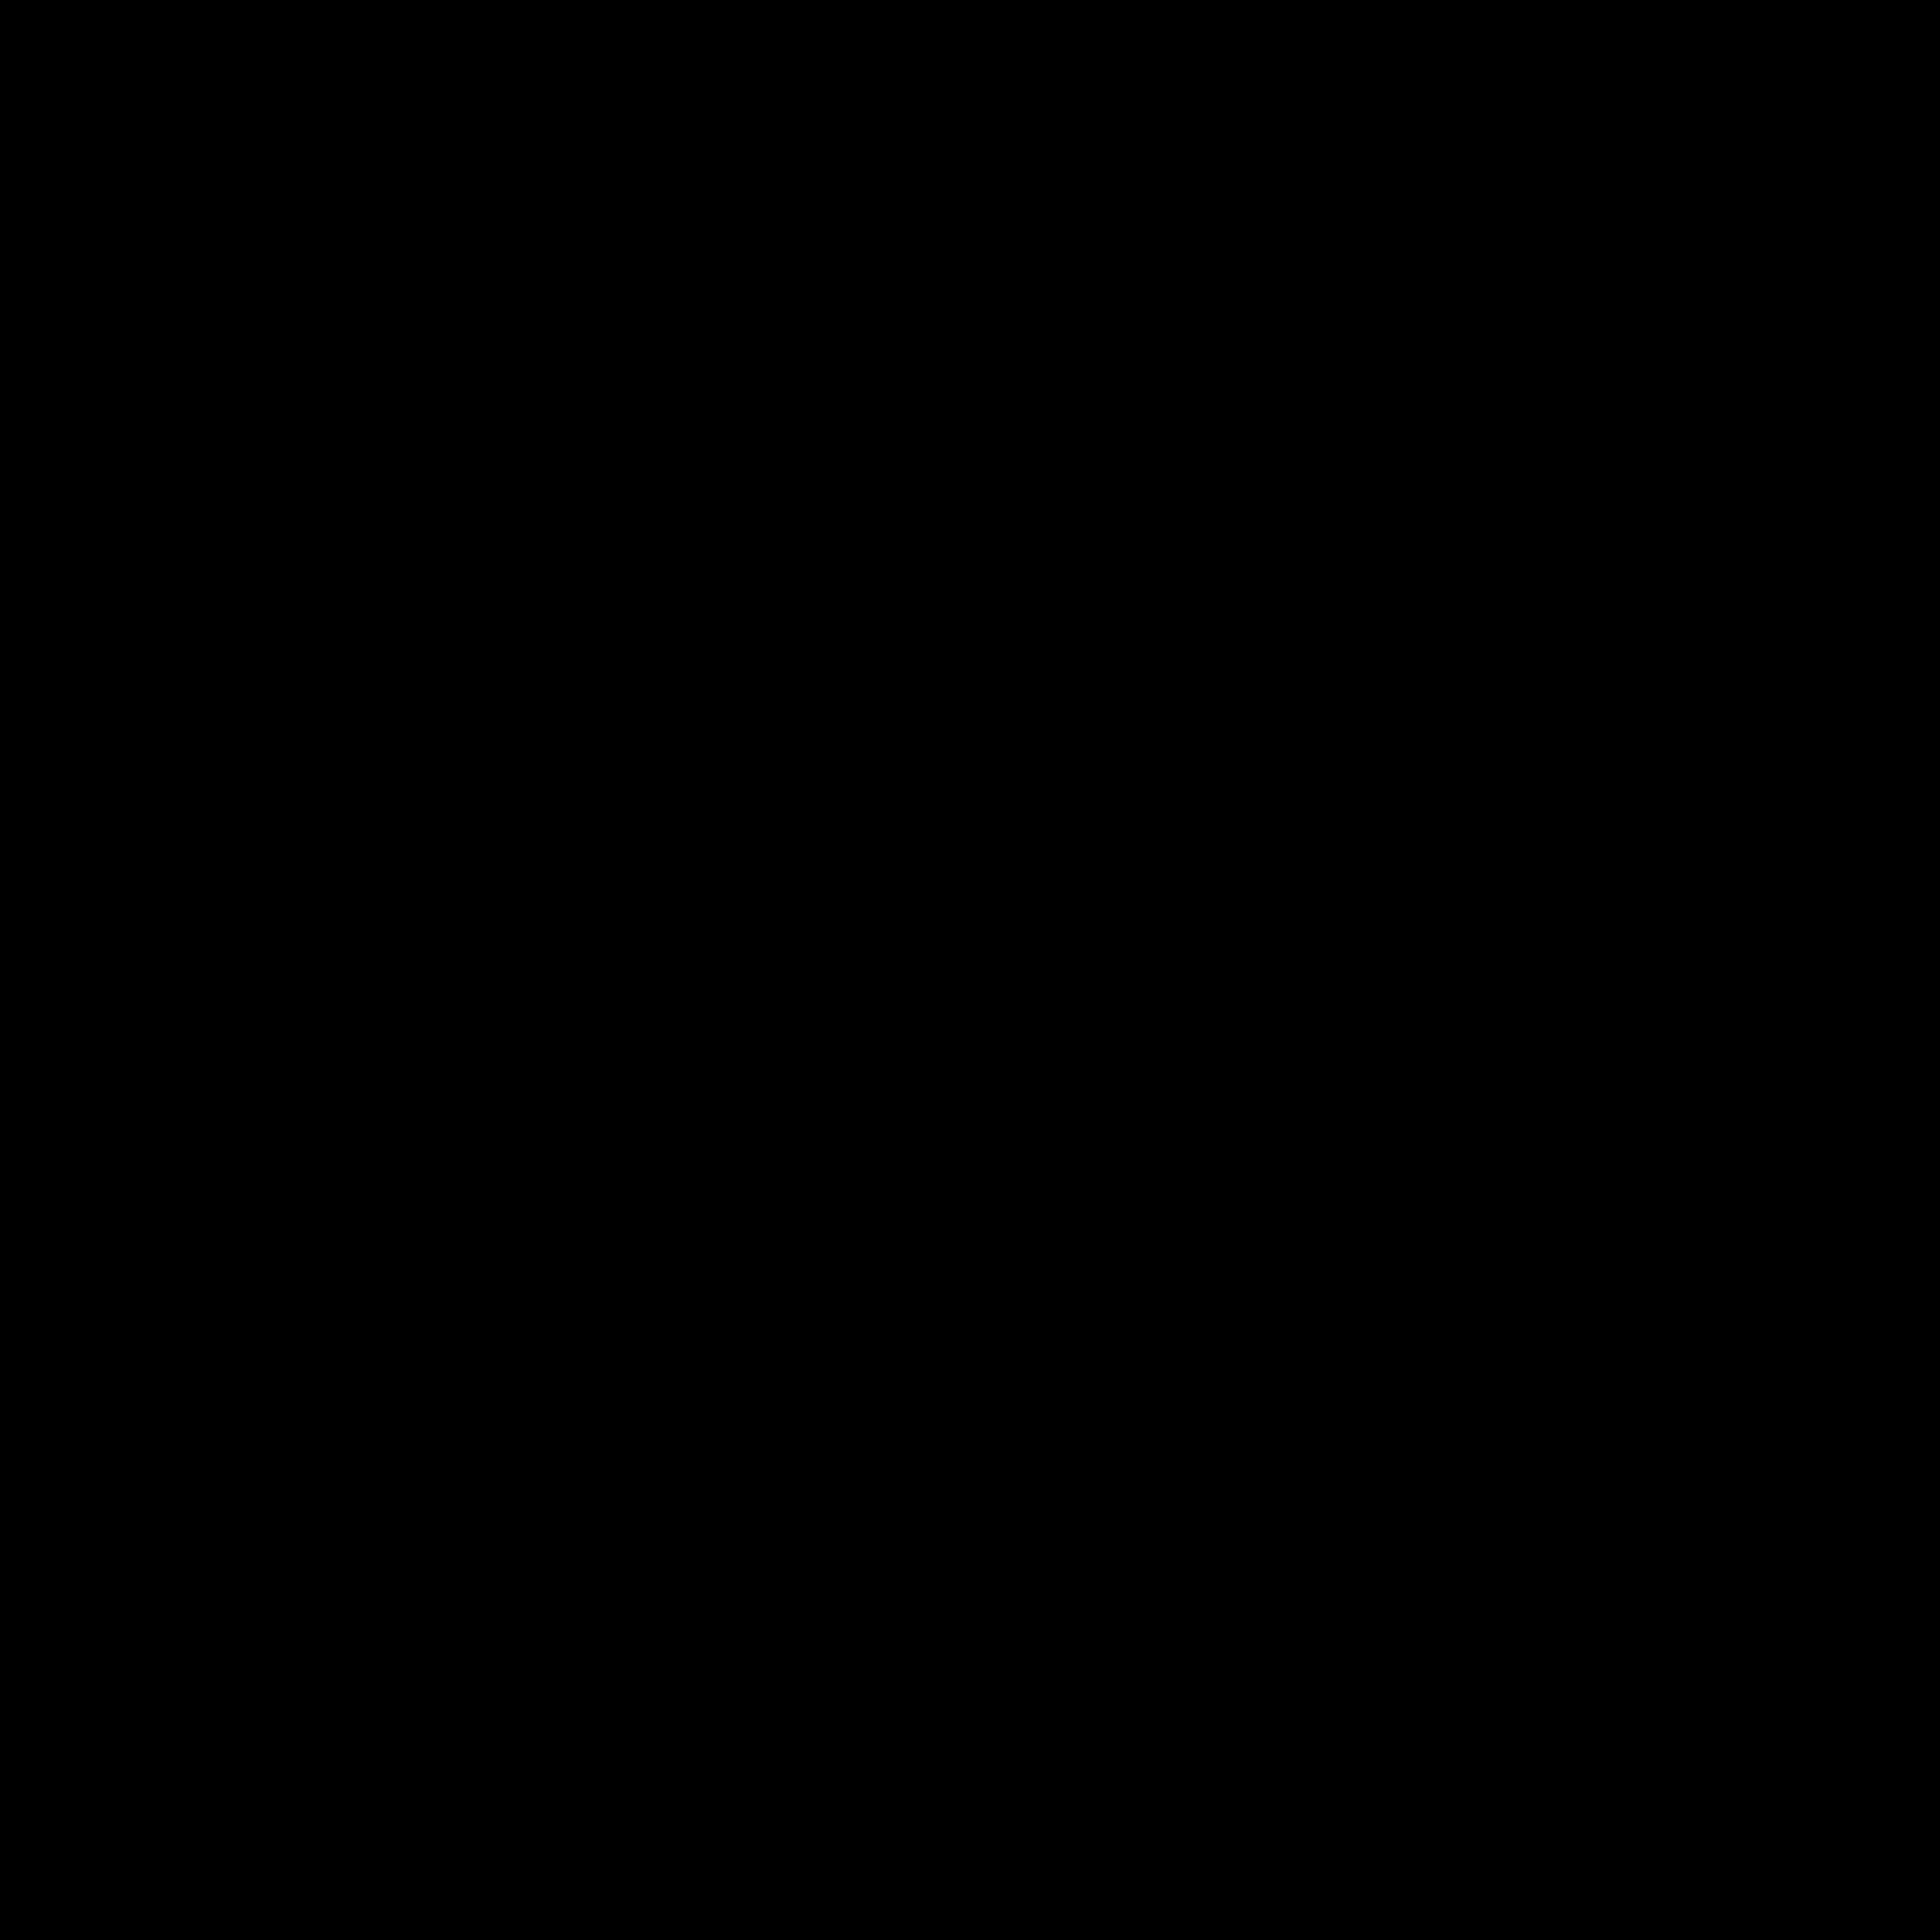 A. Finney Signature